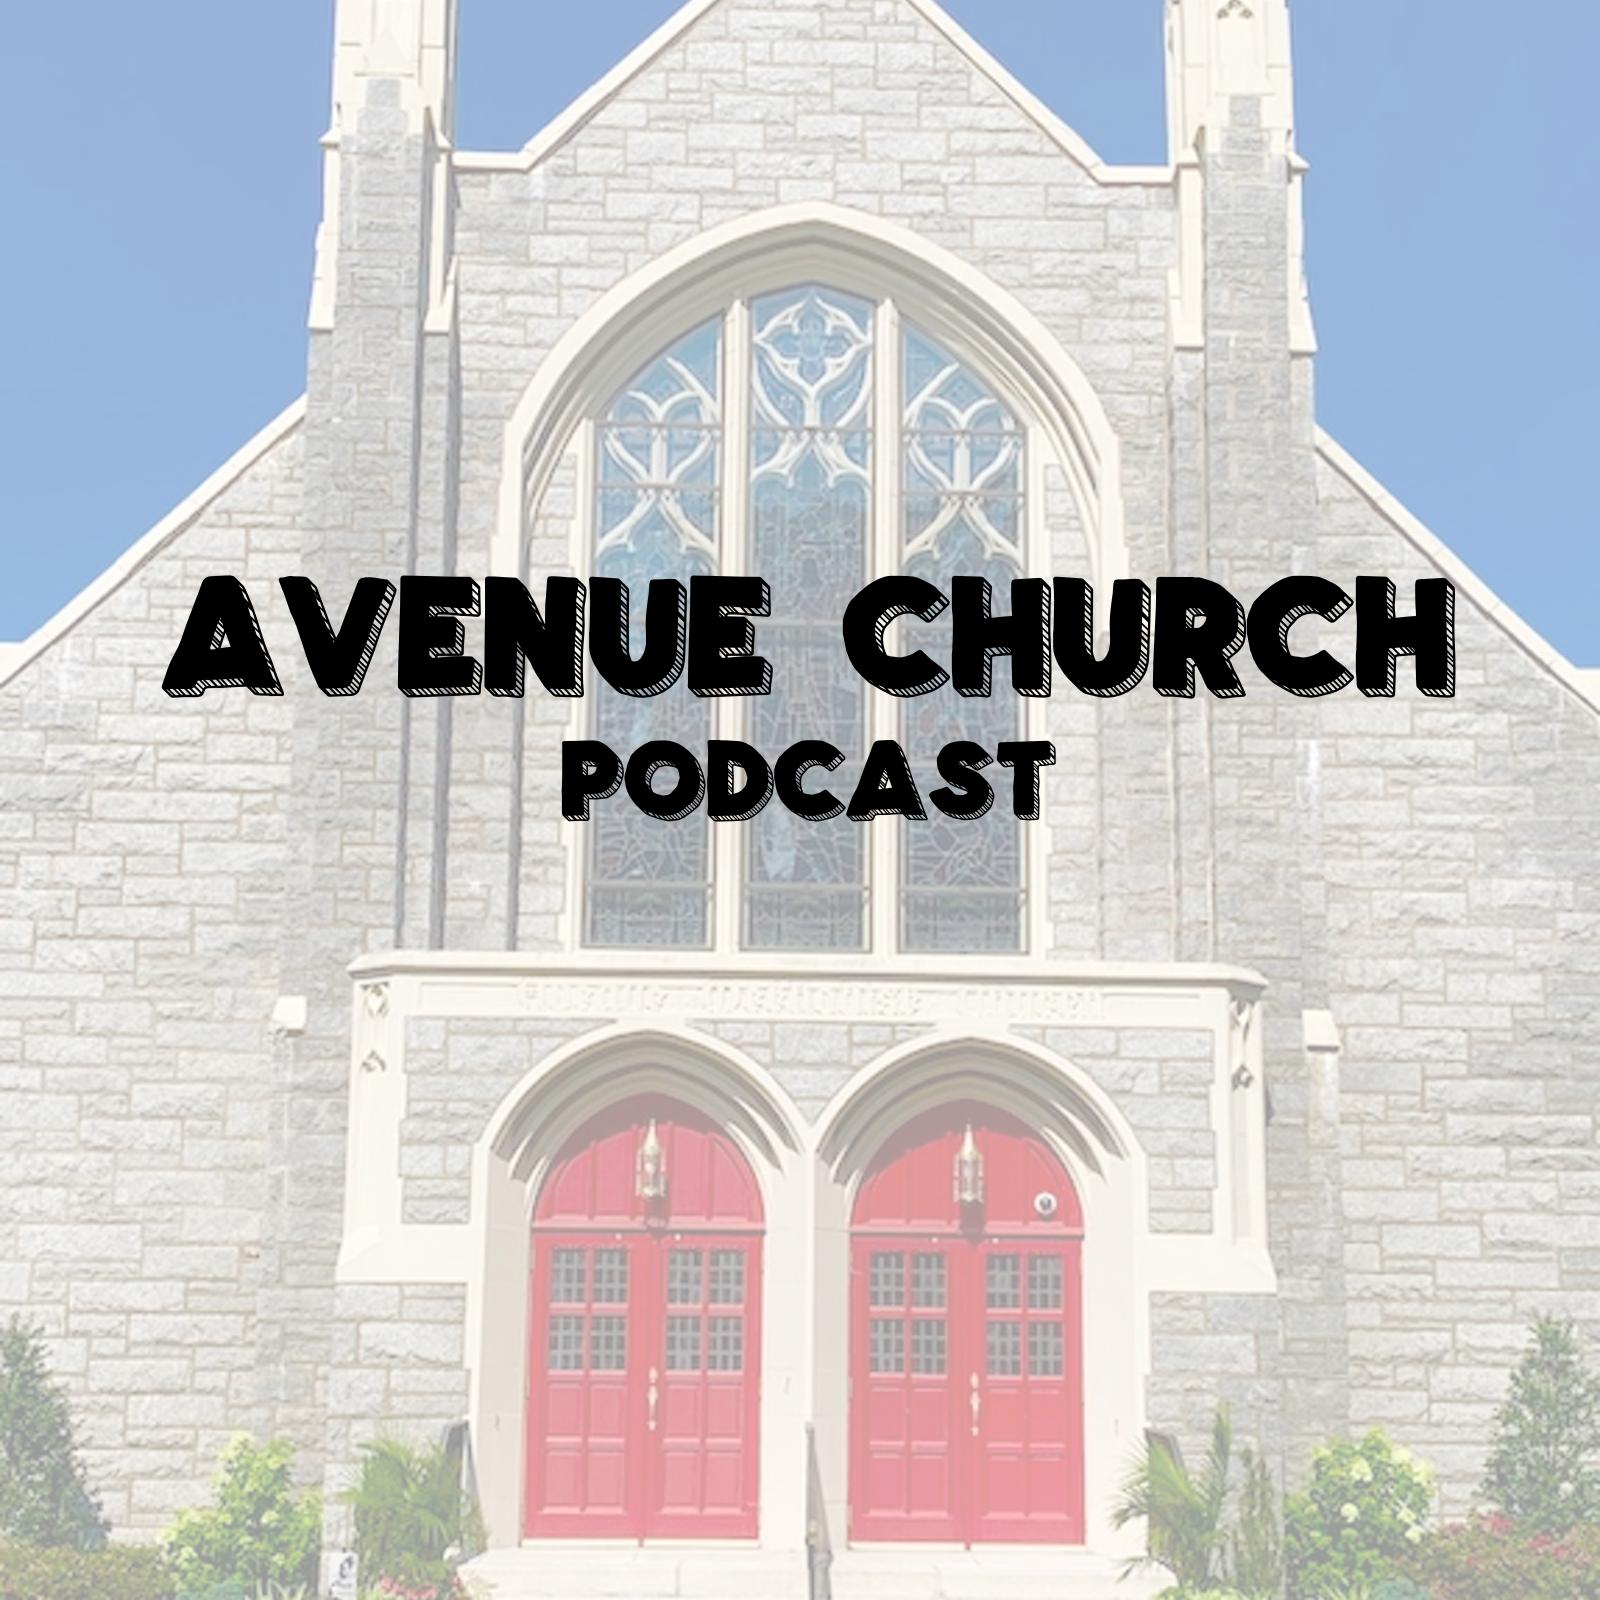 Avenue Church Podcast show art